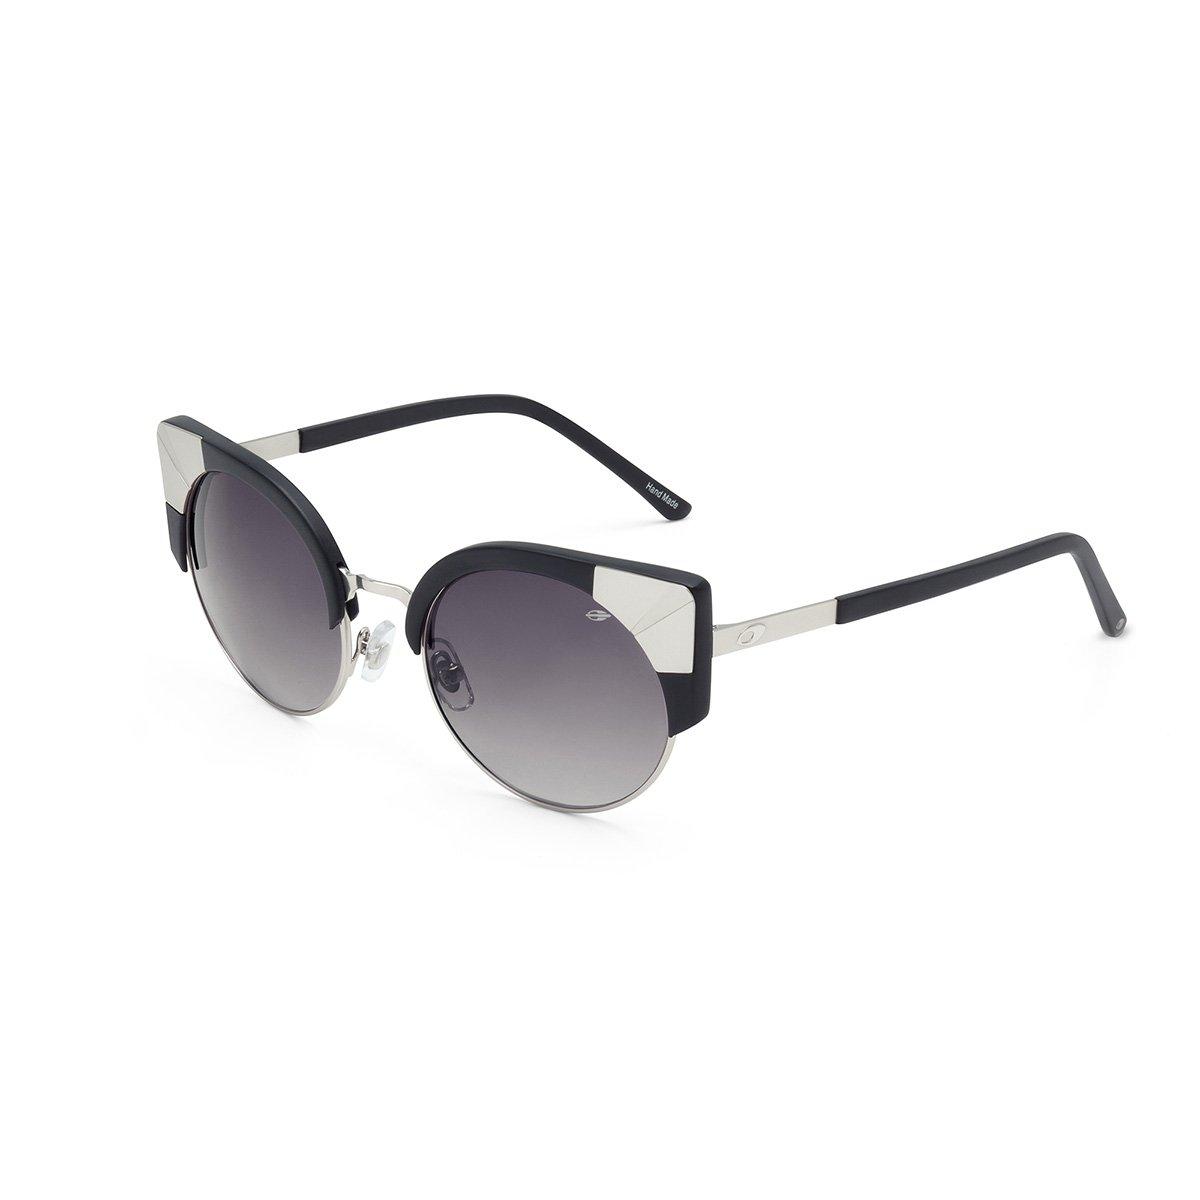 MORMAII Gafas de sol M0024 Tainah Juanuk, negro y metal